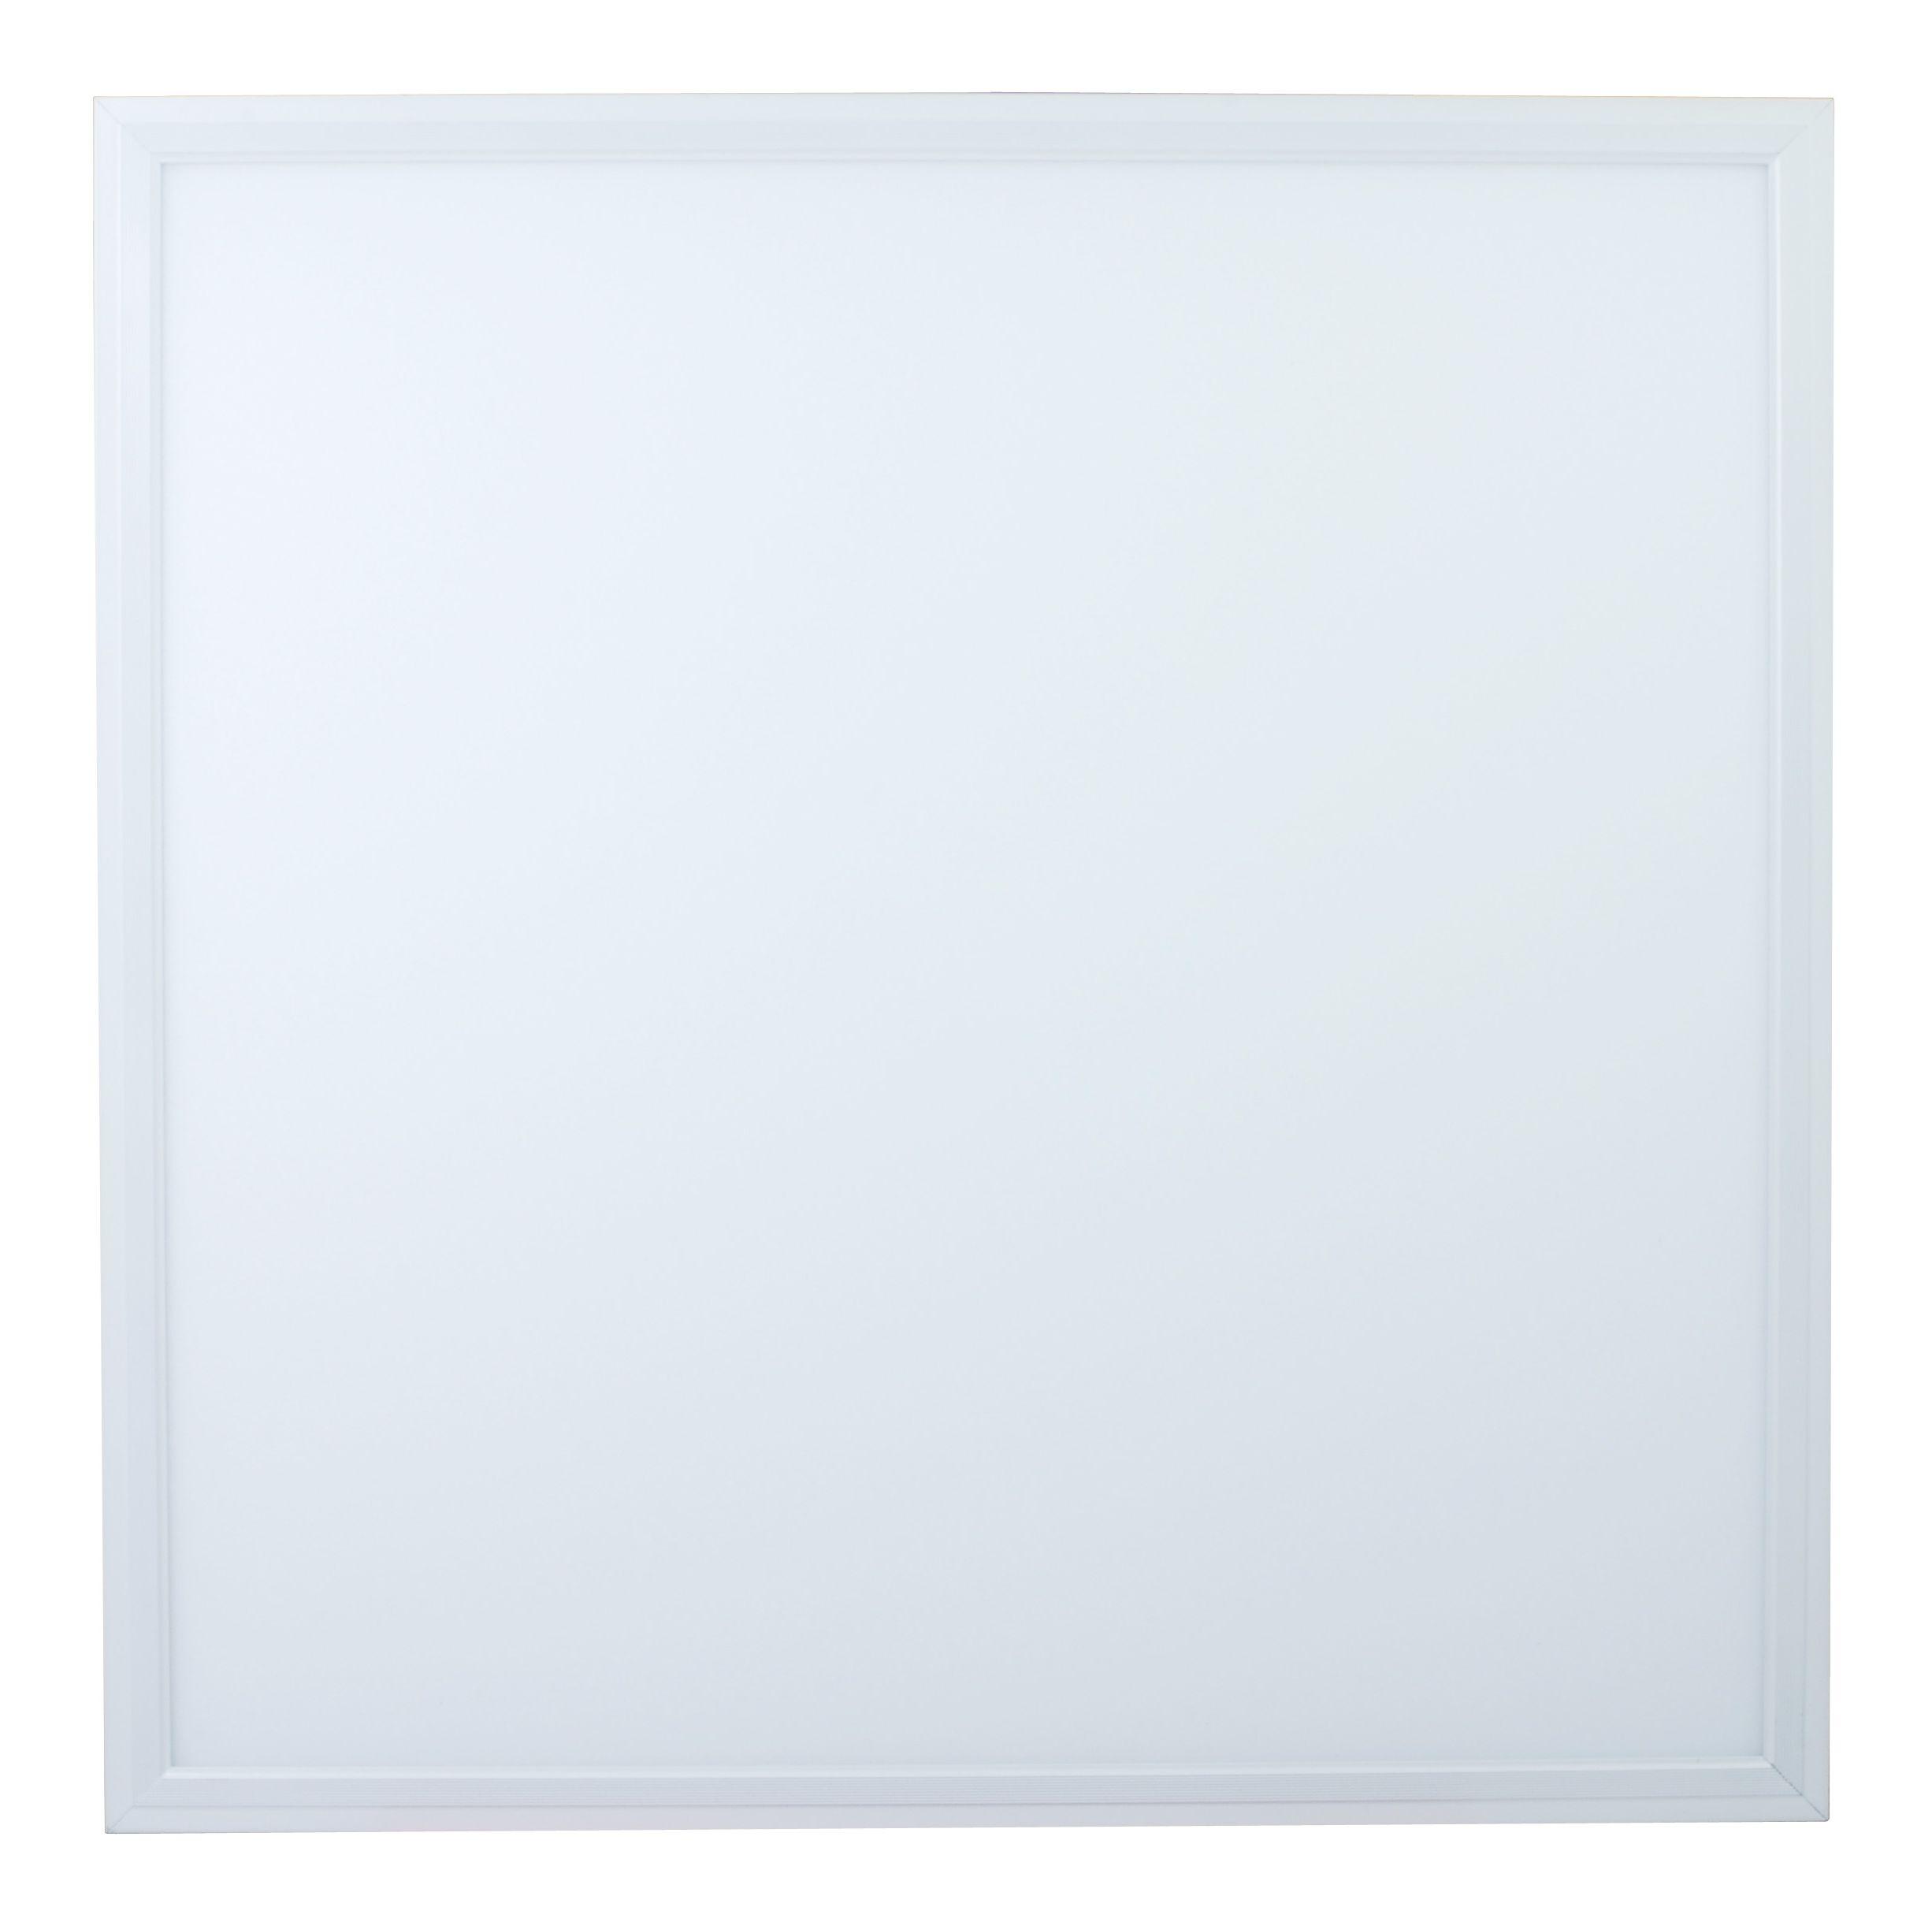 Alfatronic Biely vstavaný LED panel 600 x 600mm 40W